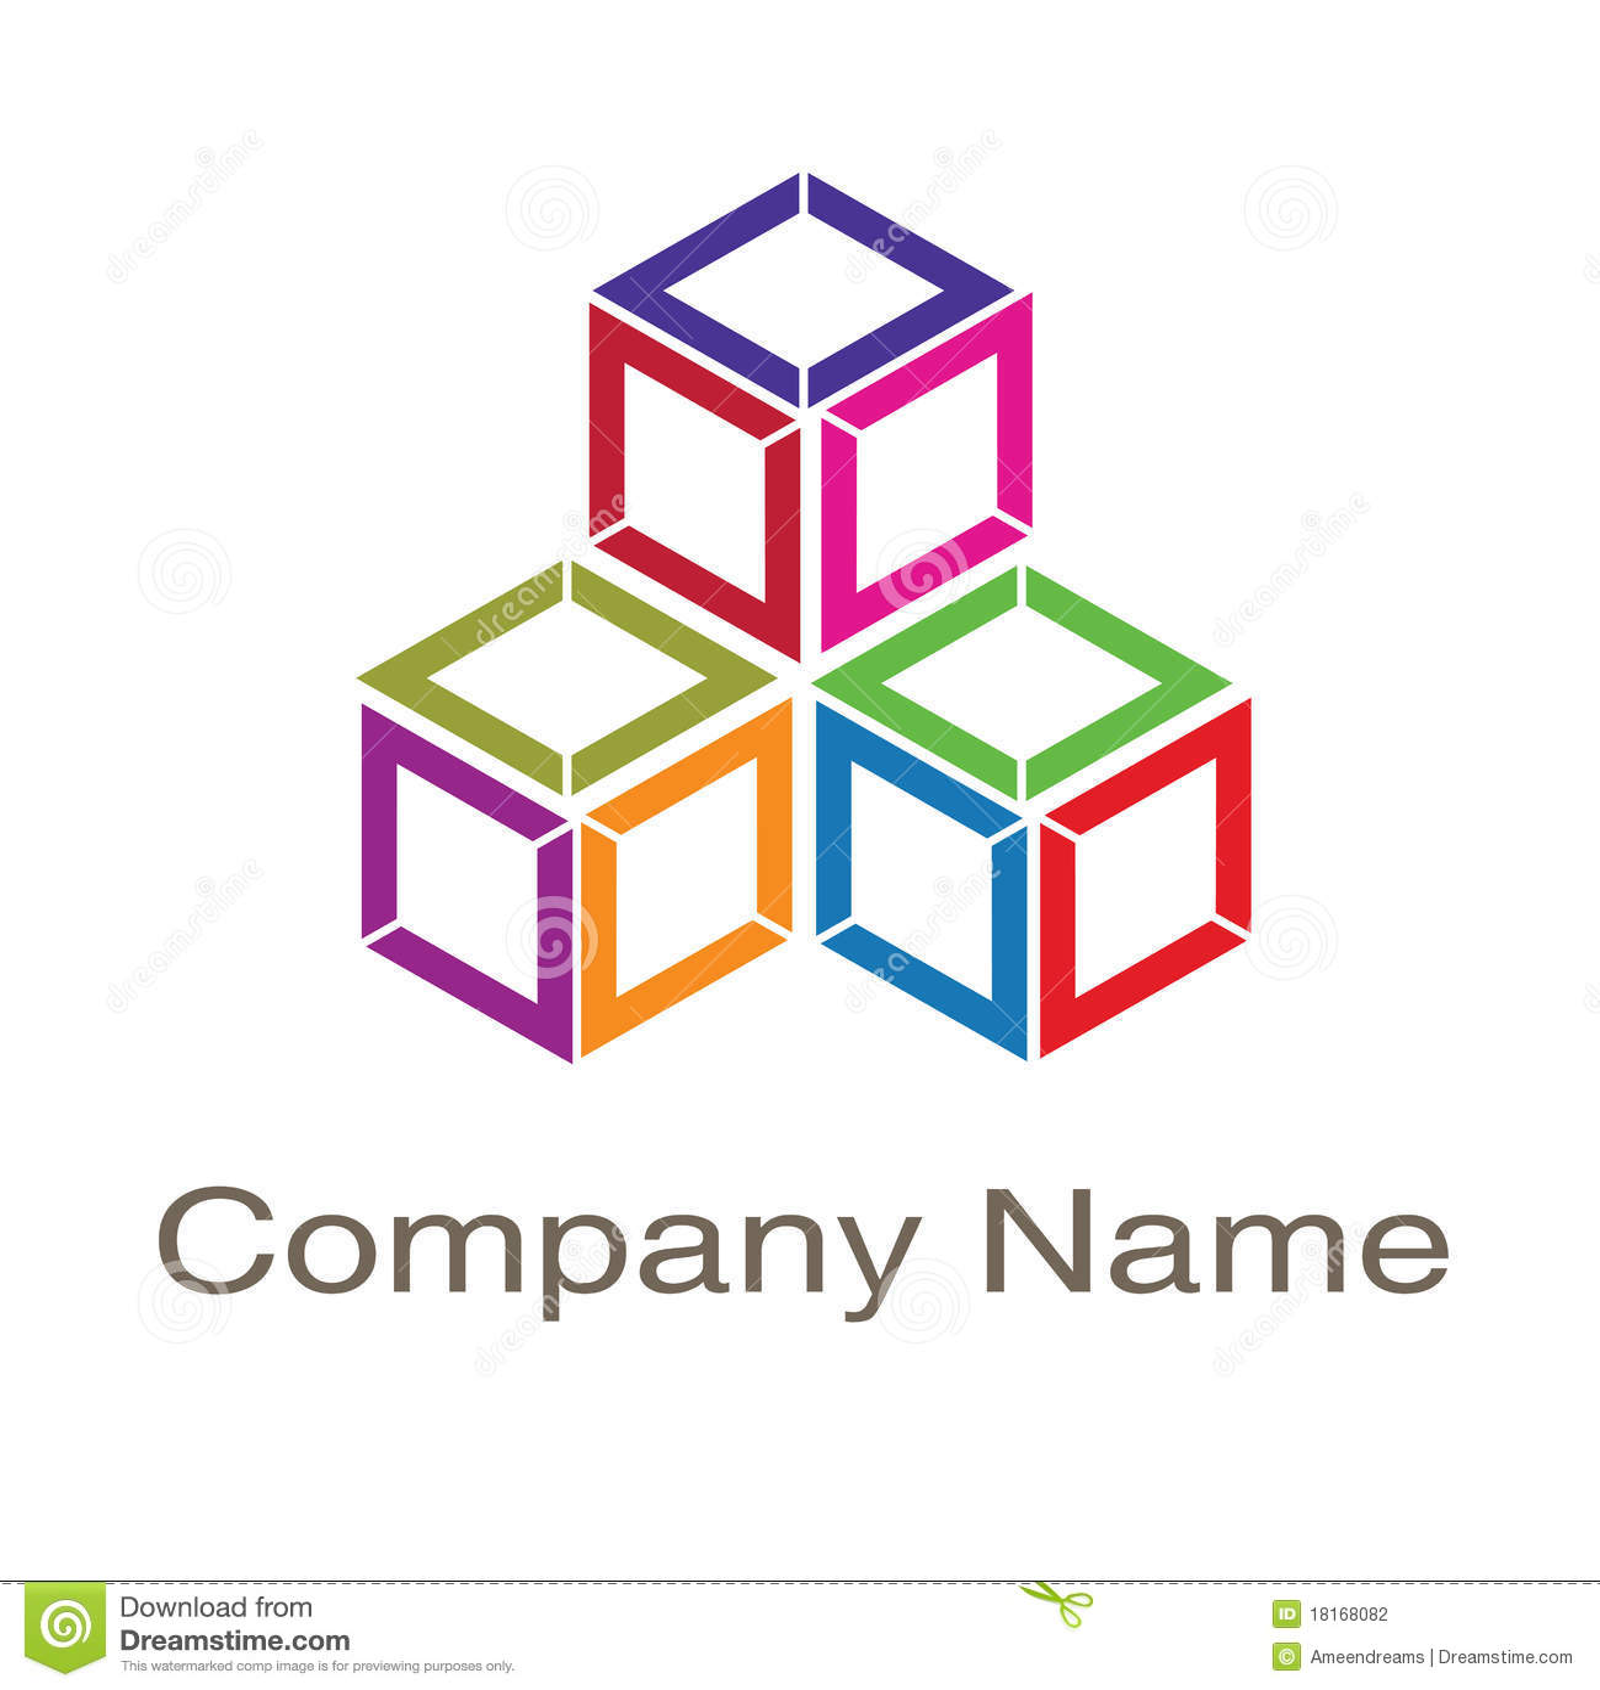 Box Logo Stock Illustration. Illustration Of Image, Tech